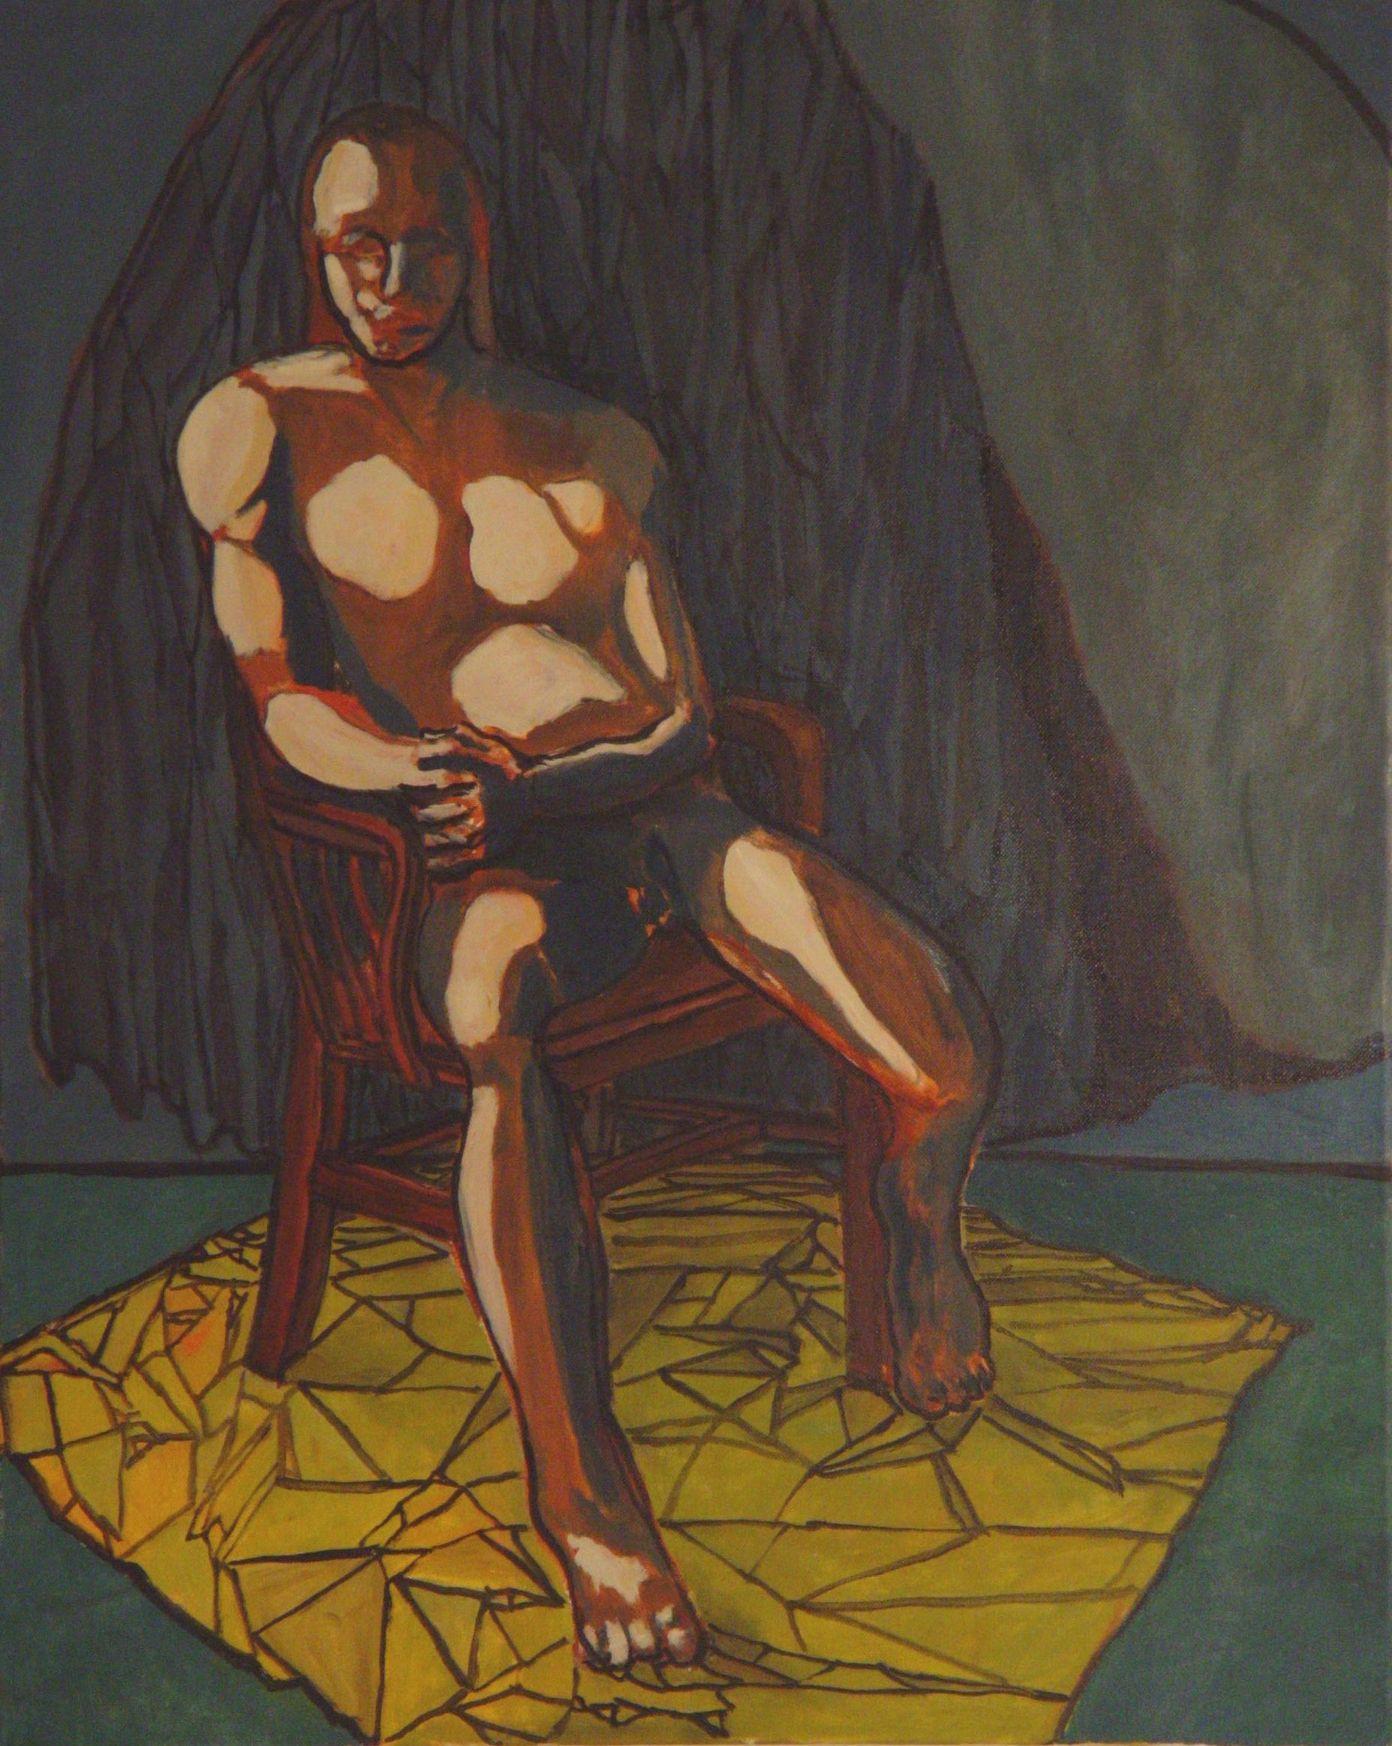 Nude Man Seated